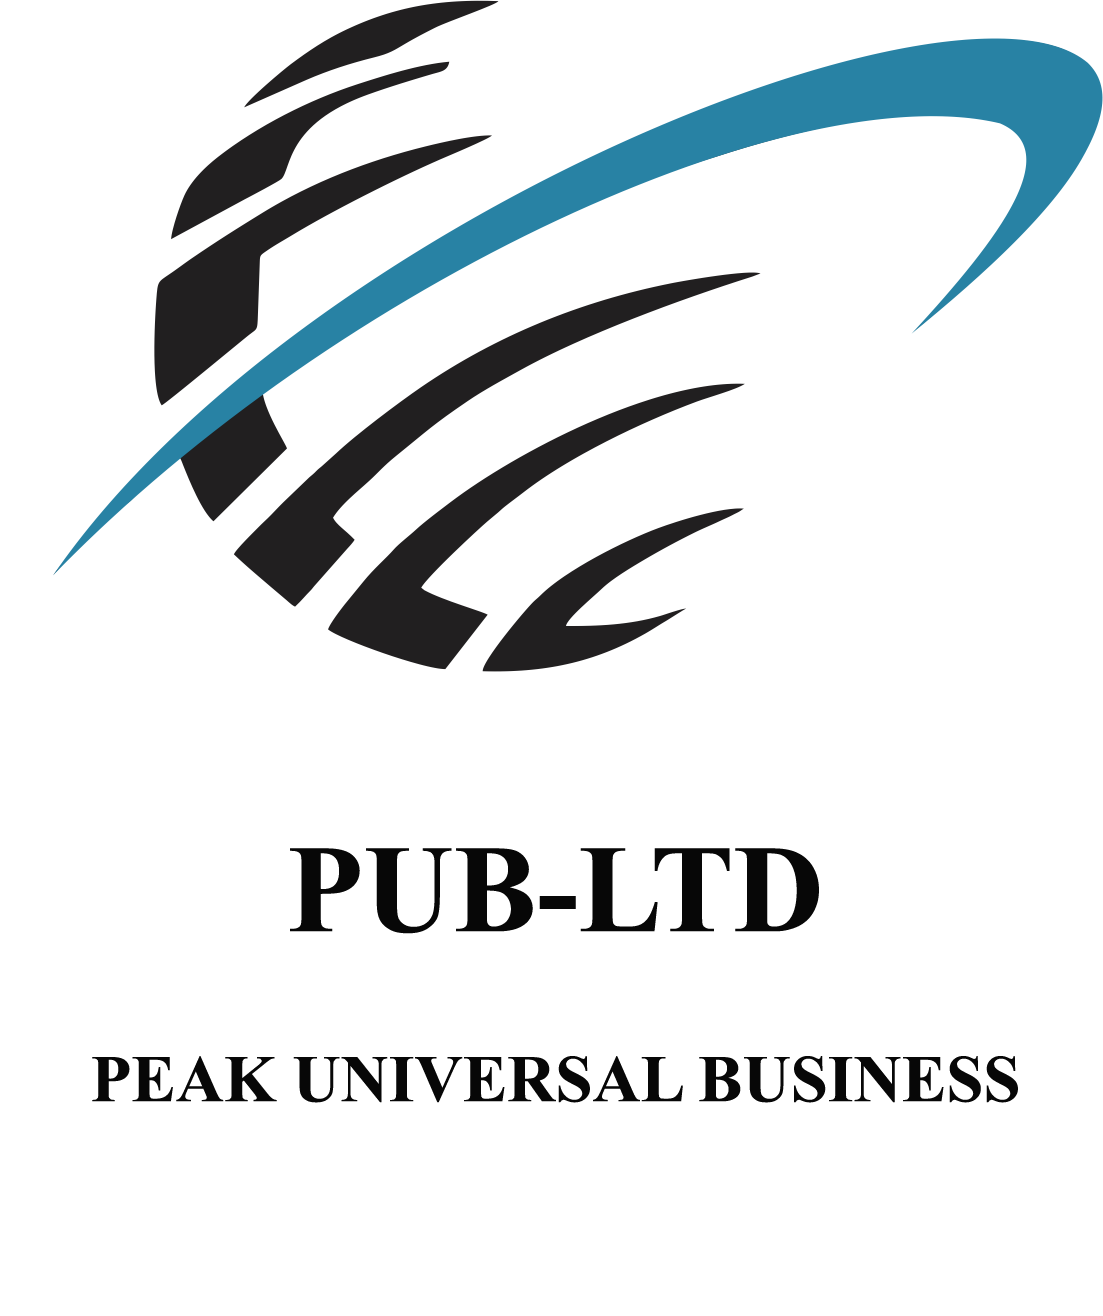 PEAK UNIVERSAL BUSINESS PETROKIMYA MADEN SANAYI TICARET LIMITED SIRKETI